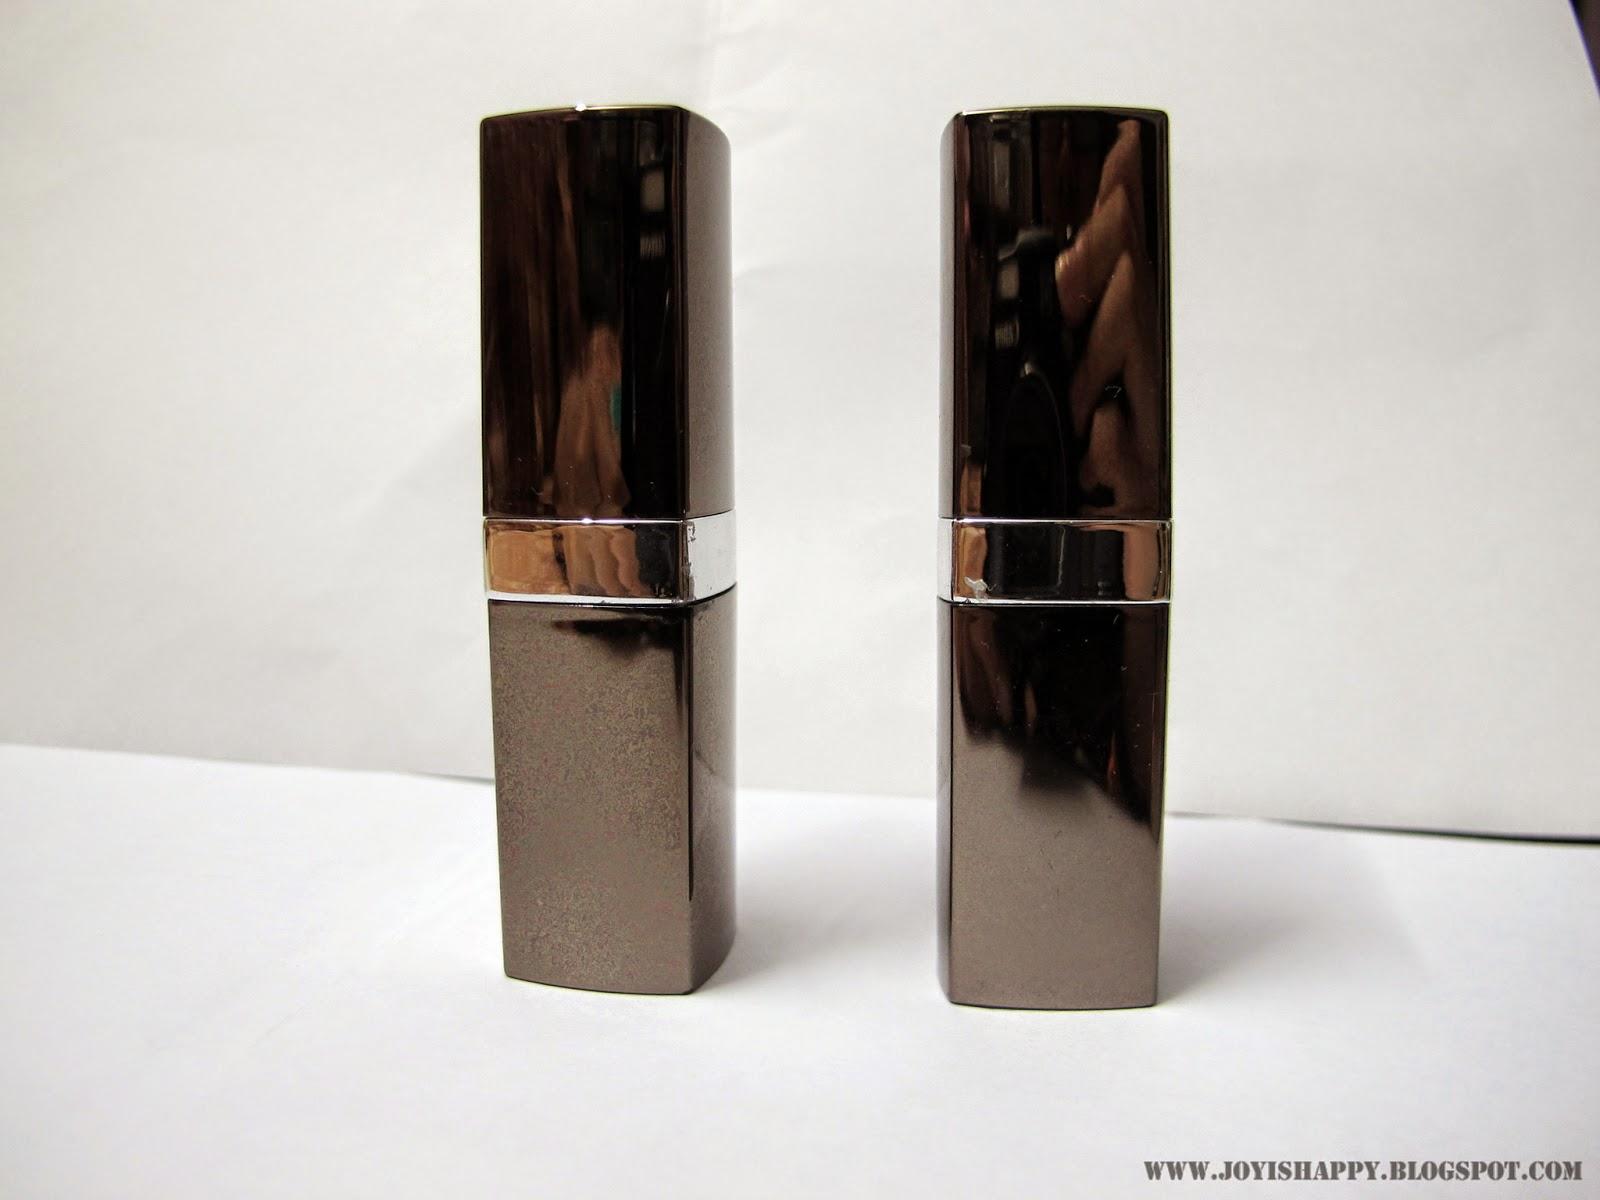 TheFaceShop Black Label Lipsticks review